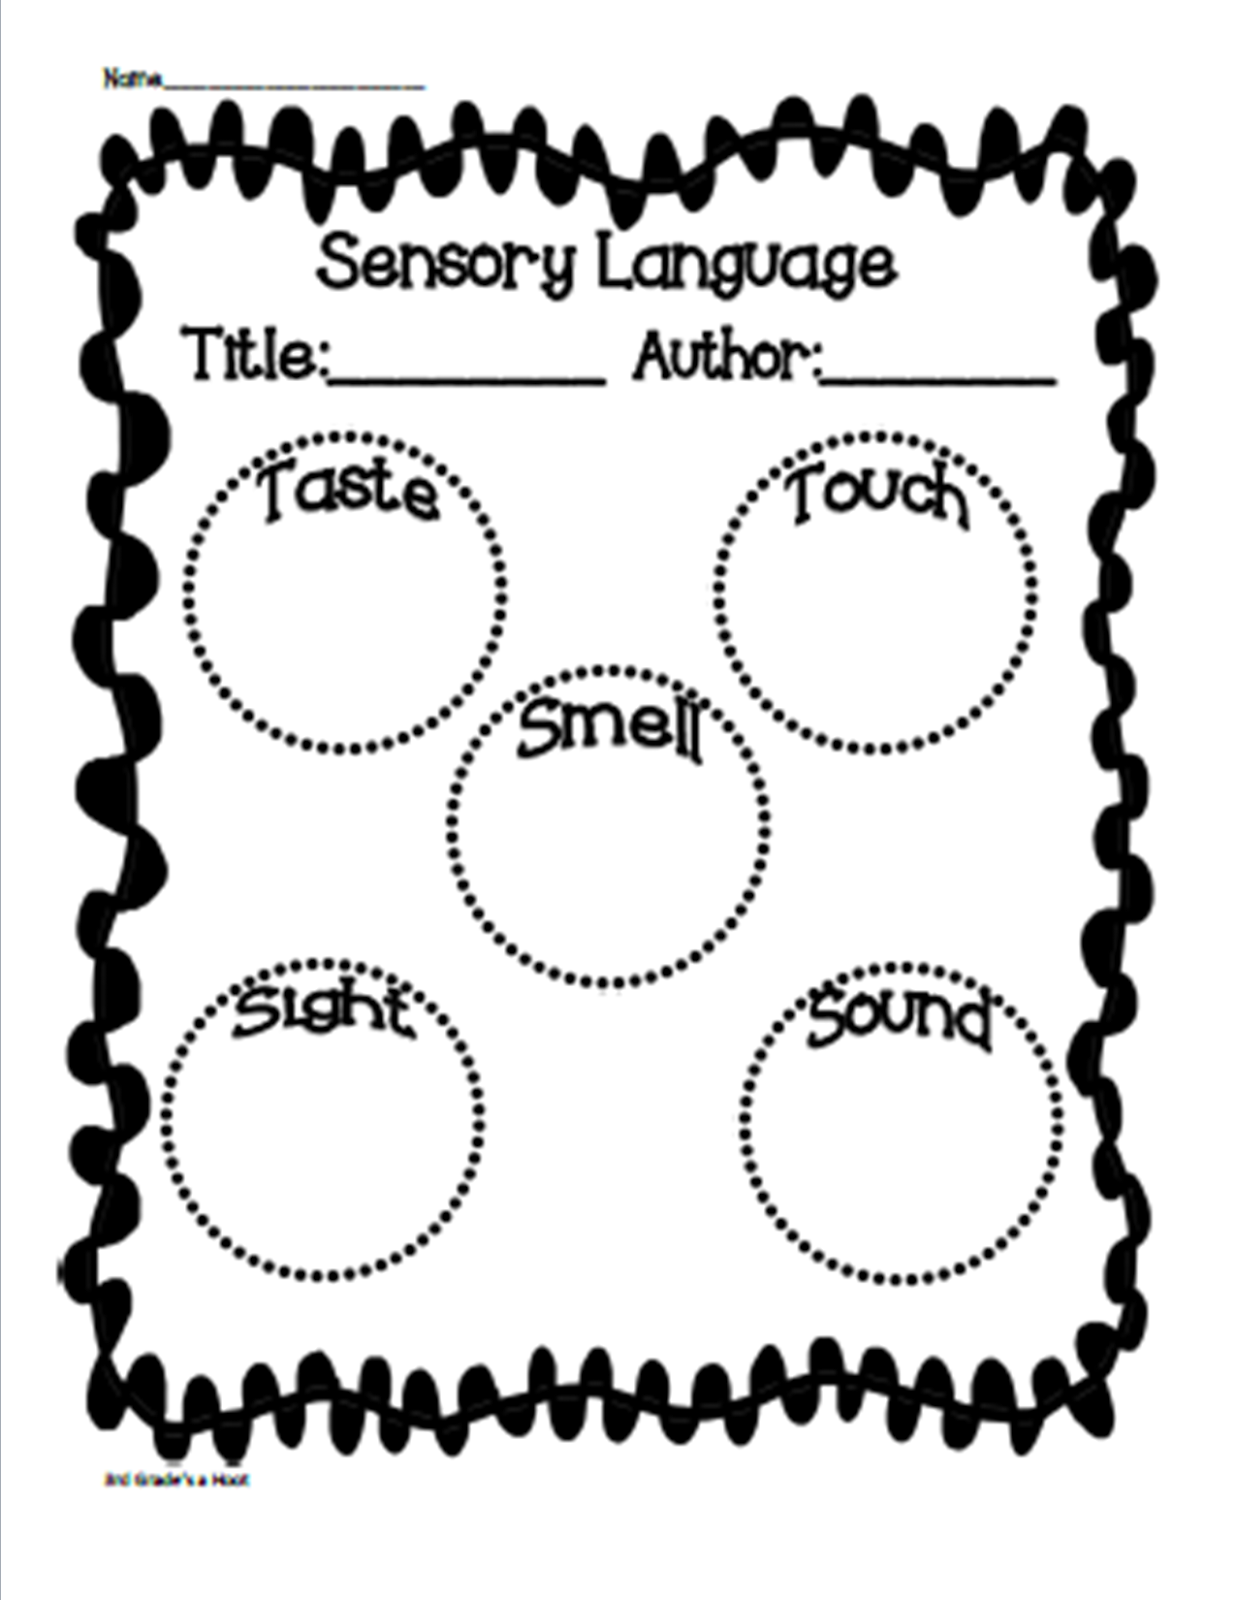 small resolution of Sensory Language Freebie-3rd Grade's a Hoot   Graphic organizers